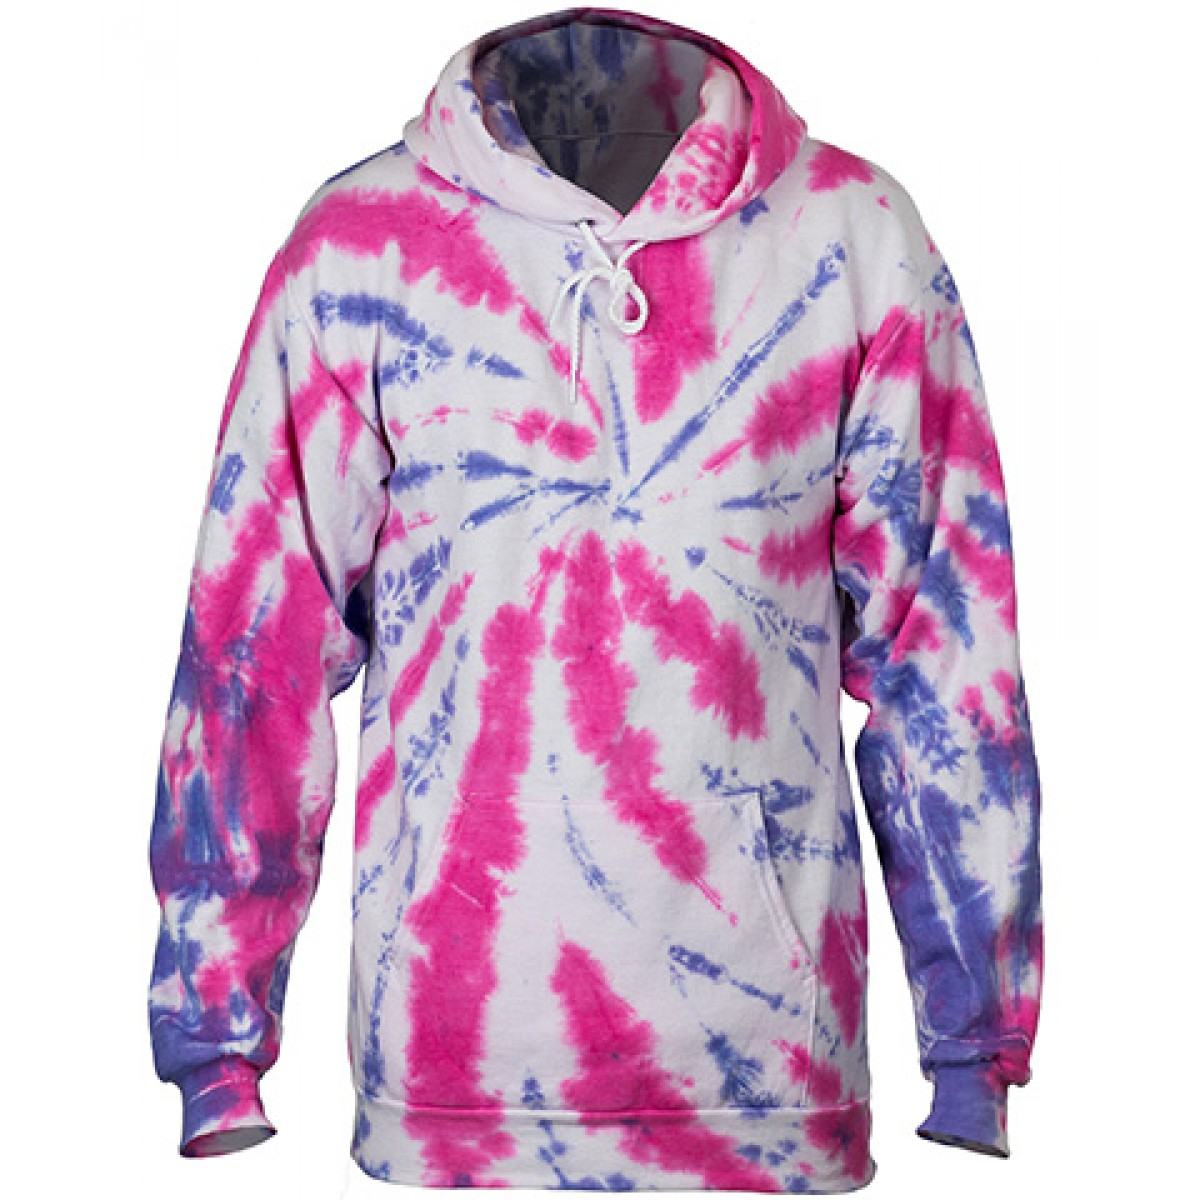 Tie-Dye Pullover Hooded Sweatshirt-Pink-XL